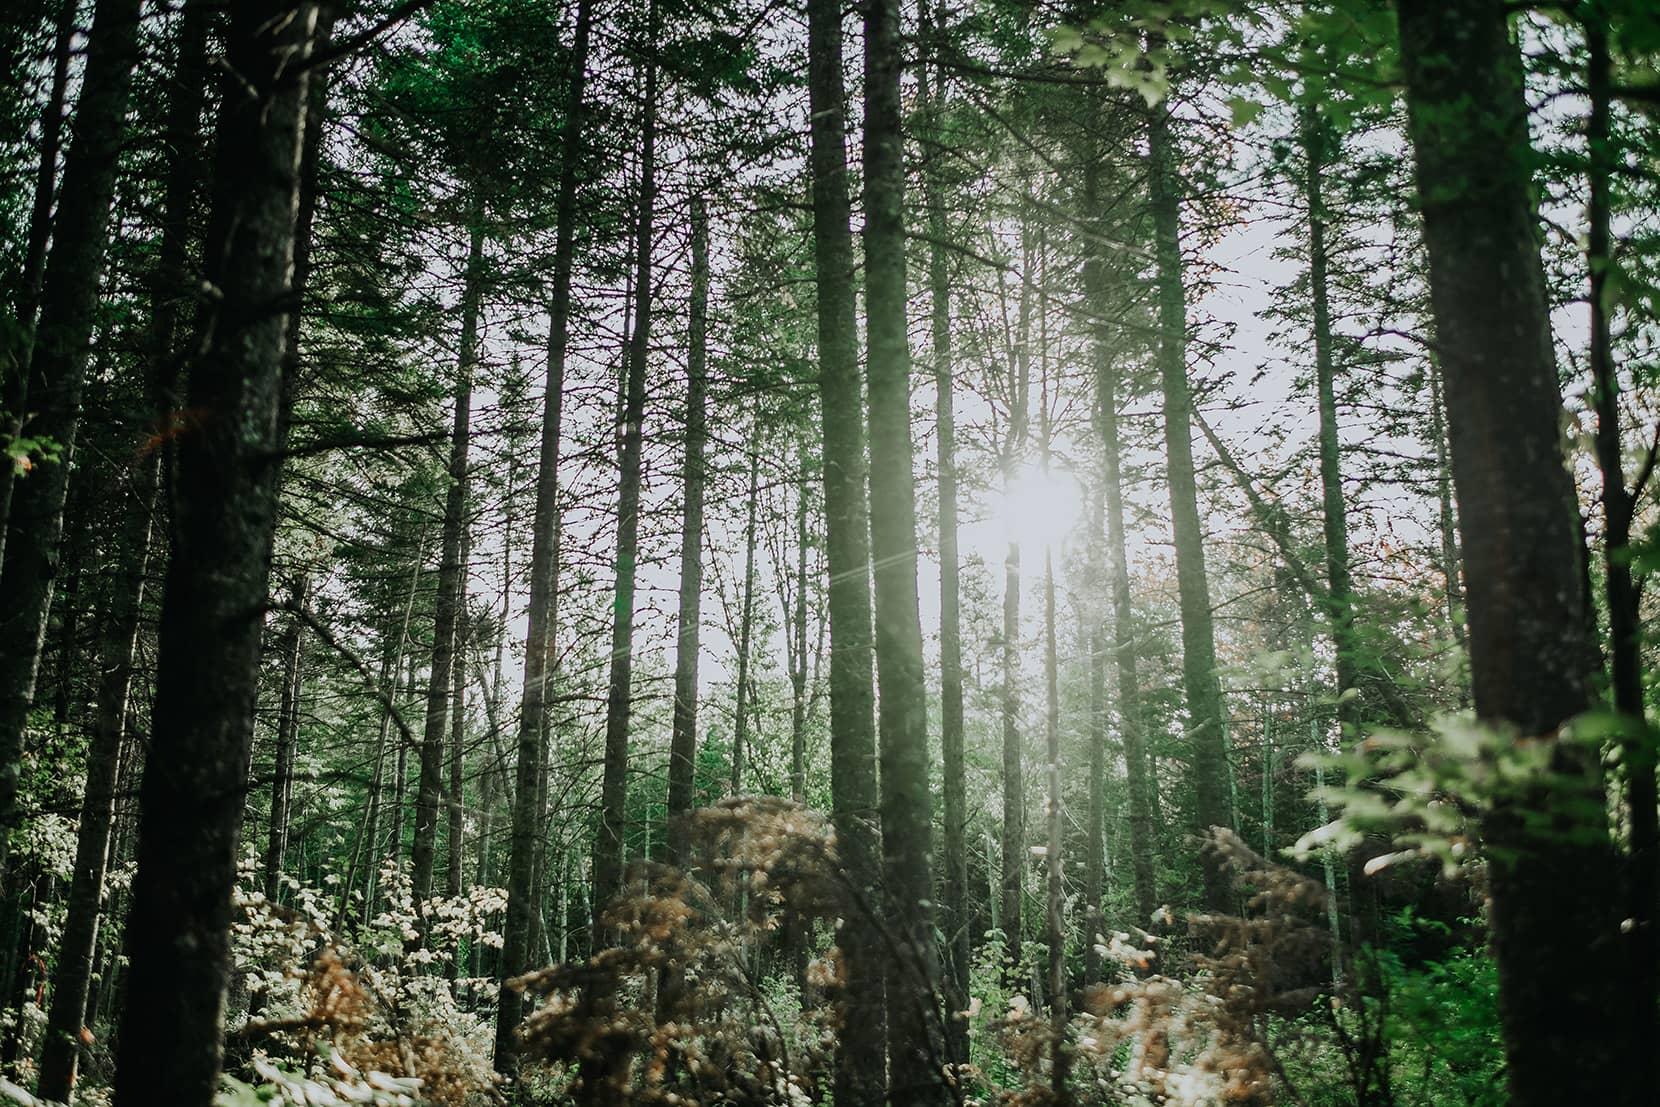 Laforêt - Plan d'aménagement forestier